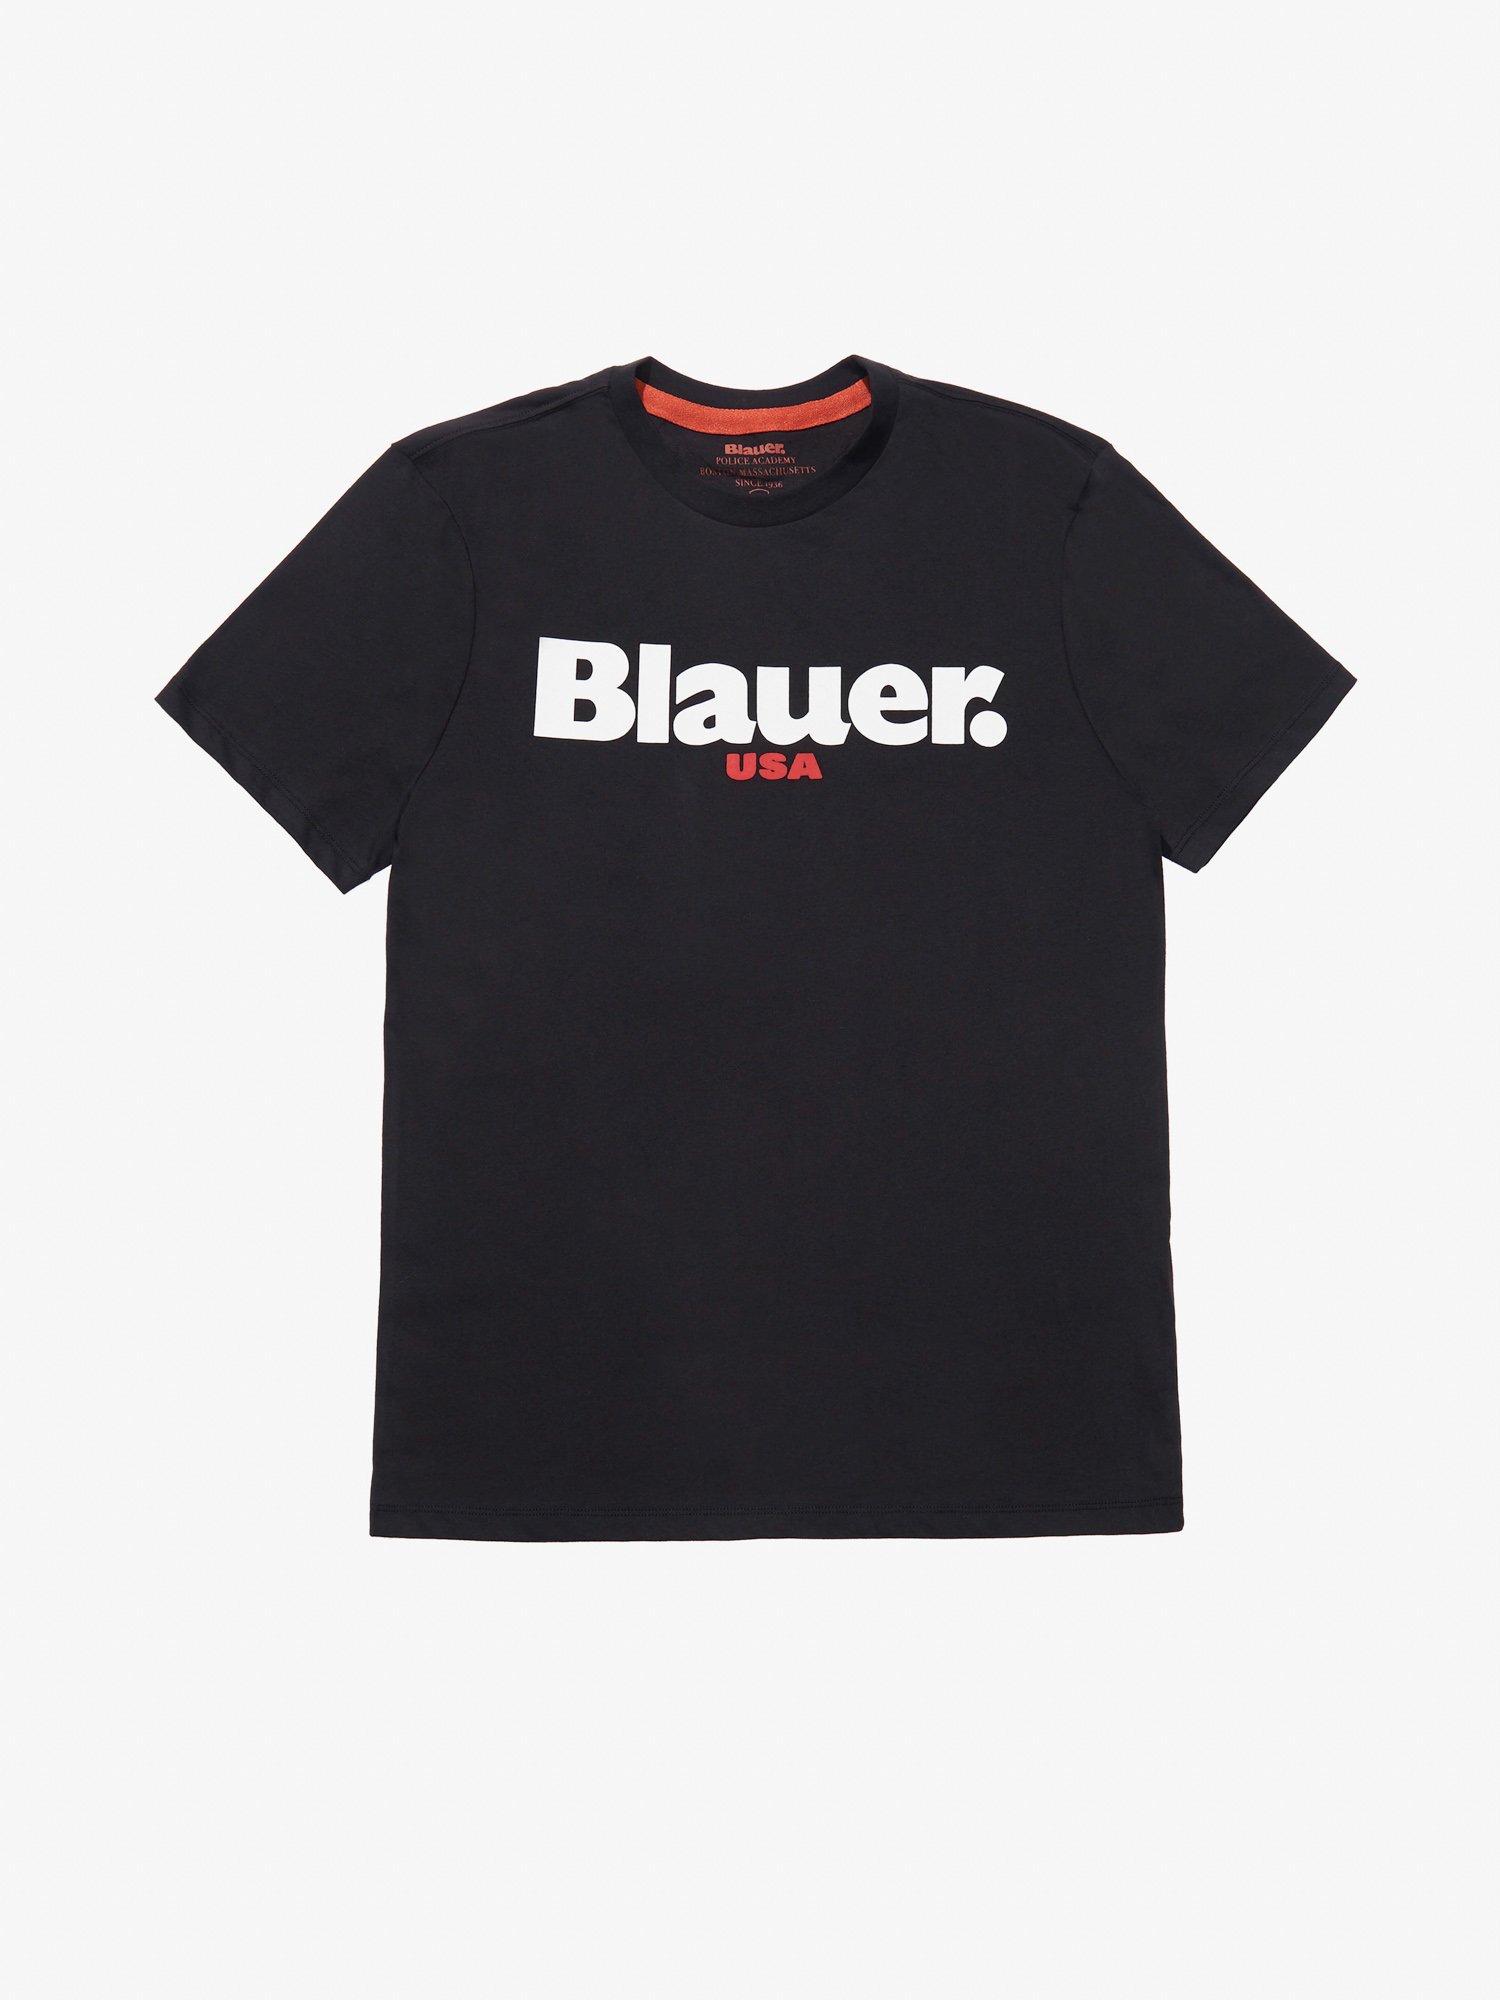 T-SHIRT CARBON-WASHED BLAUER USA - Blauer